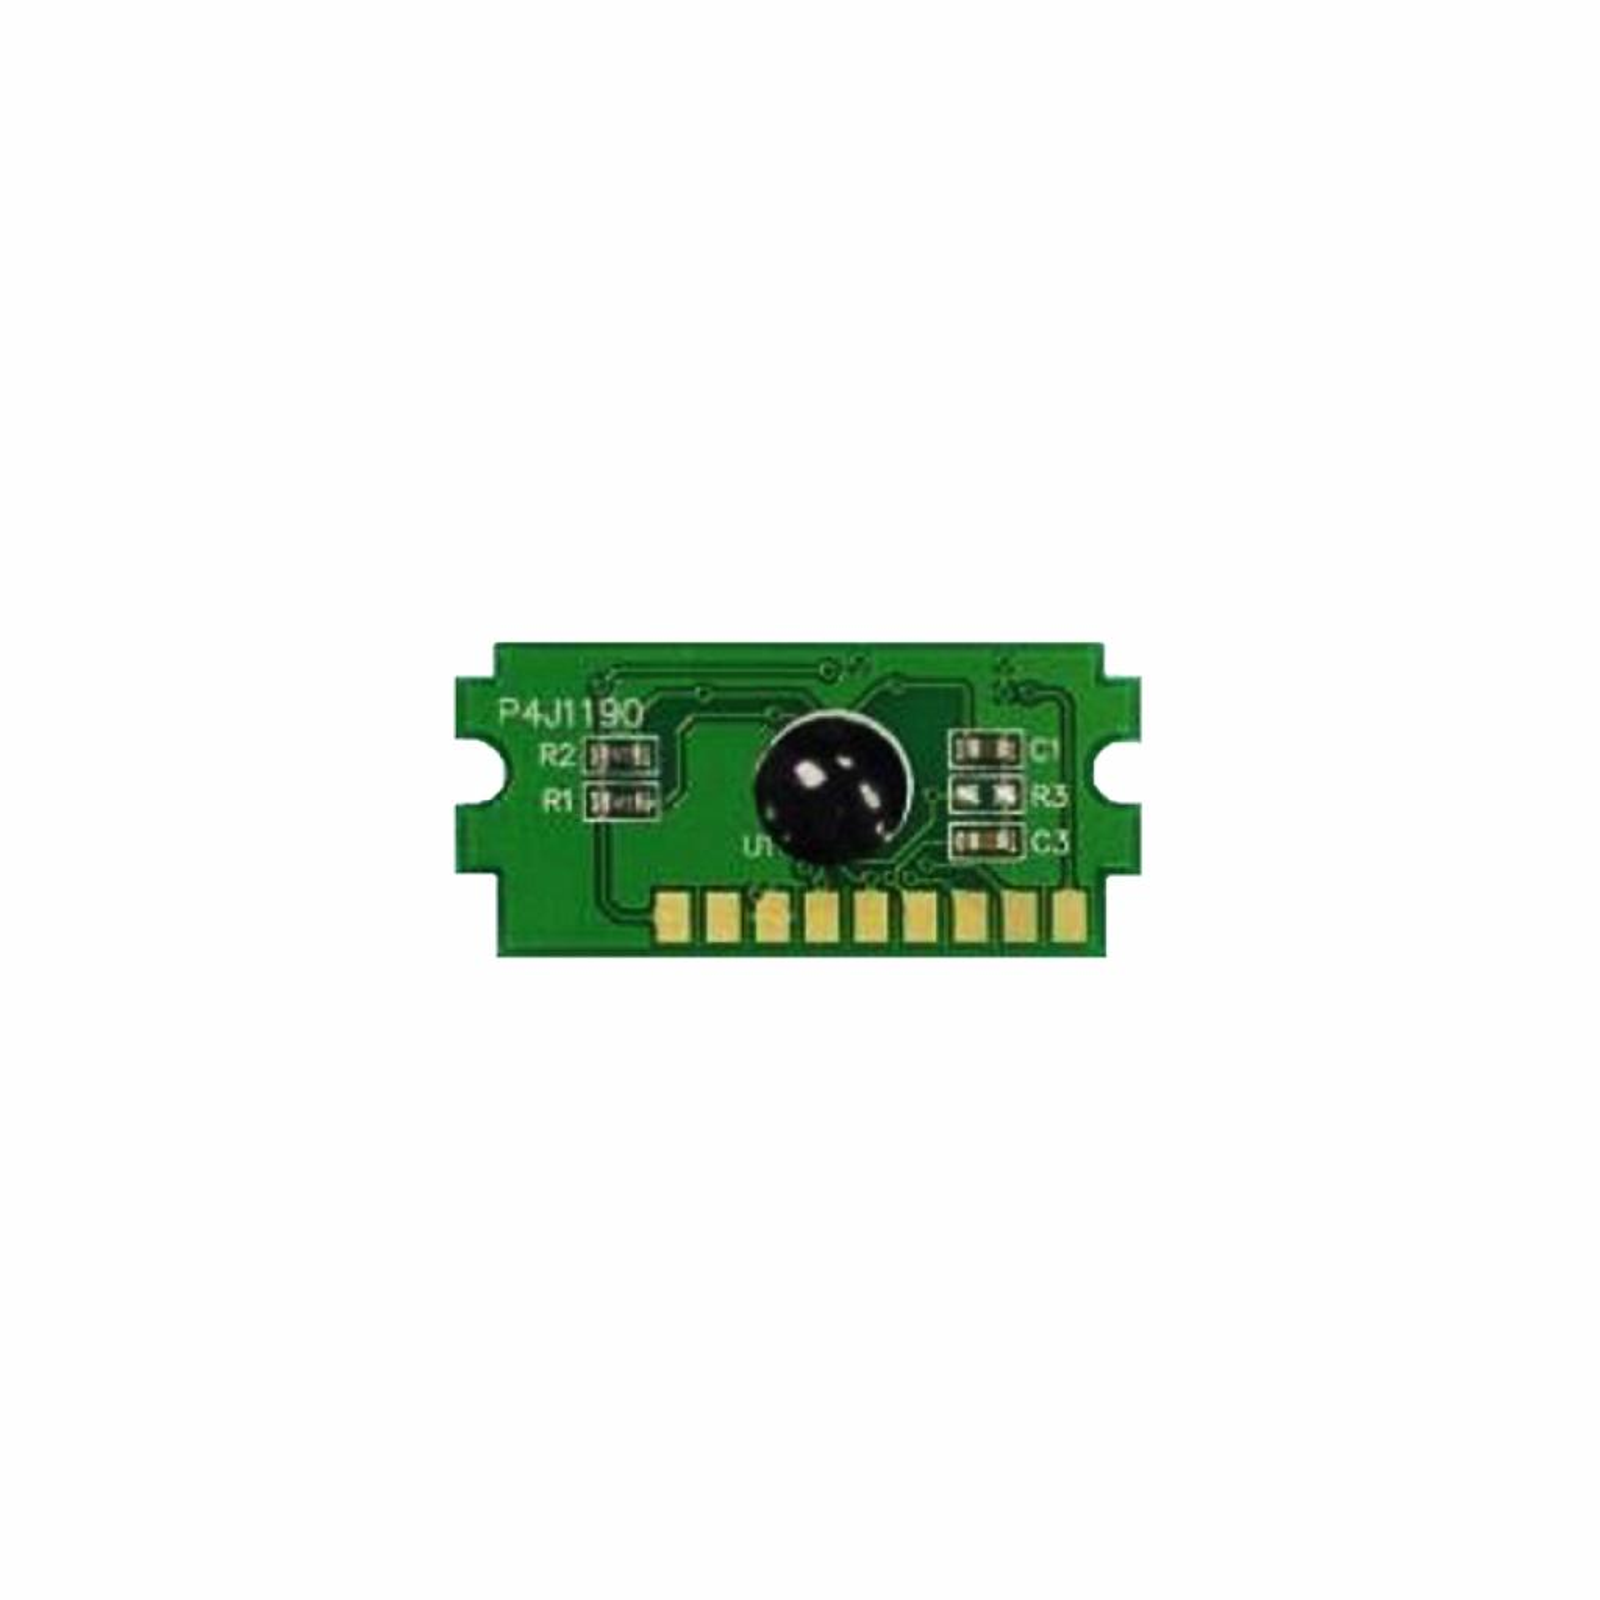 Чип для картриджа Kyocera TK-5140Y (EU) 5k yellow Static Control (TK5140CP-YEU)